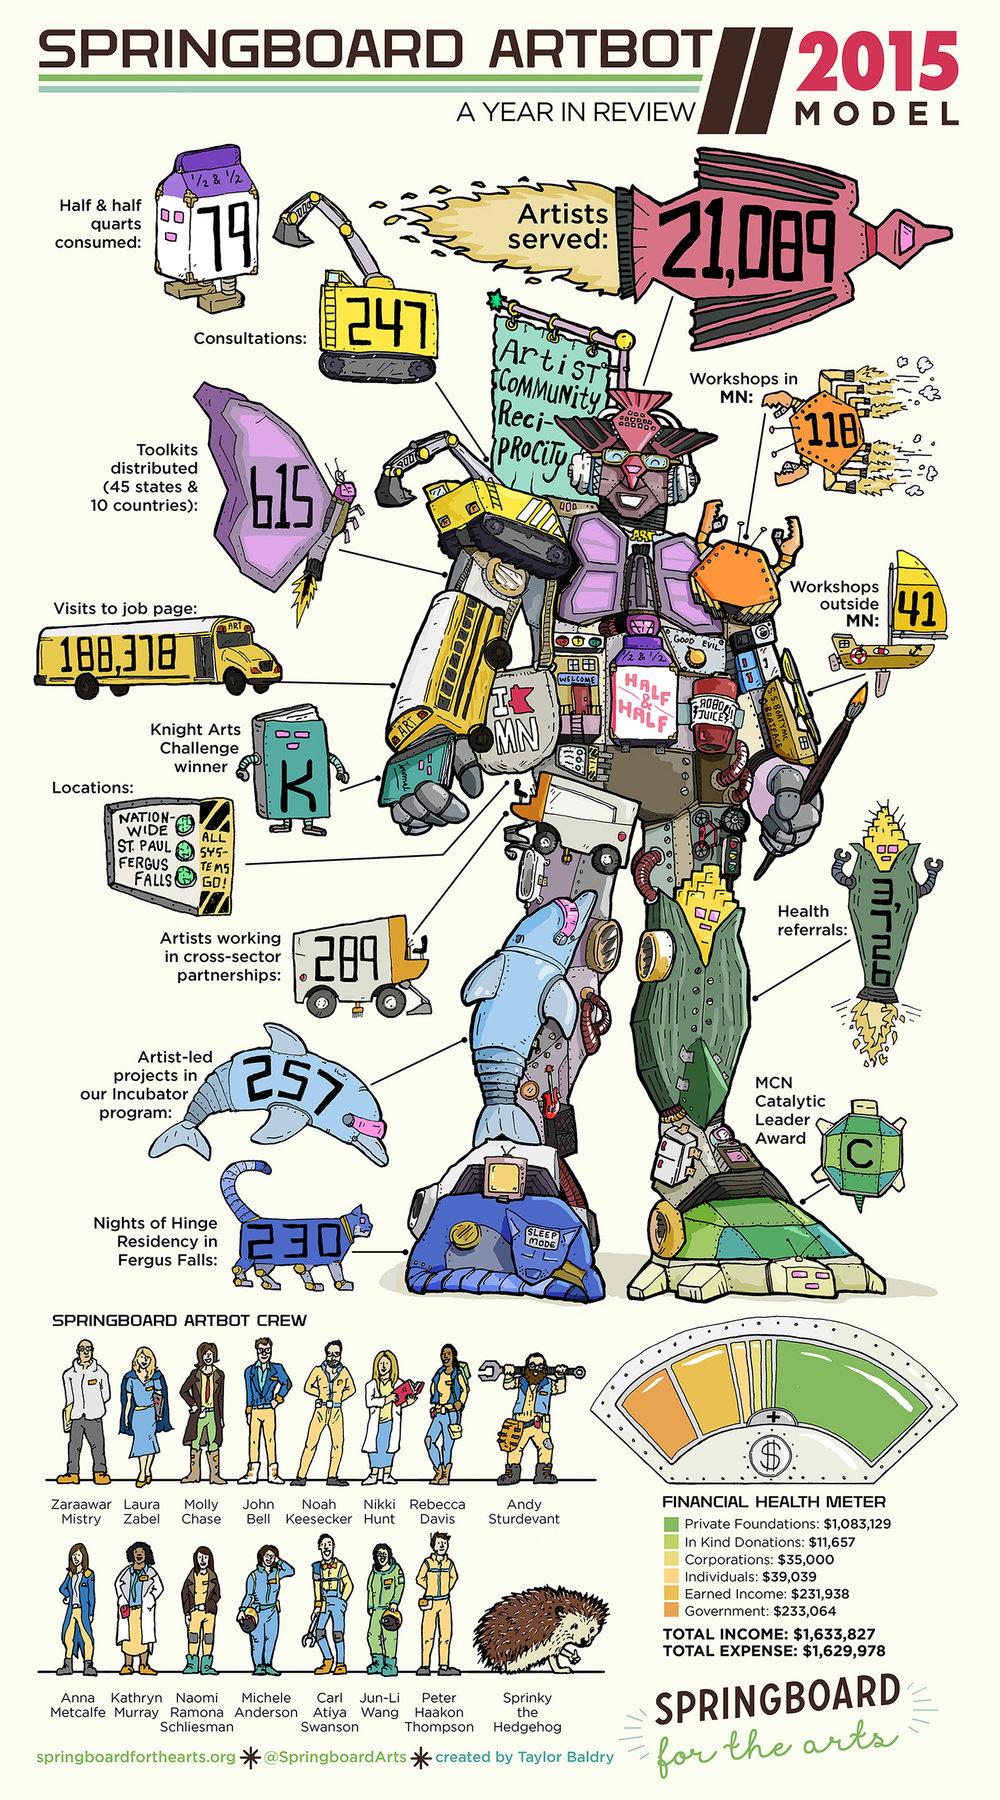 Taylor-Baldry-Springboard-Artbot-Annual-Report-Full-Taylor-Baldry.jpg